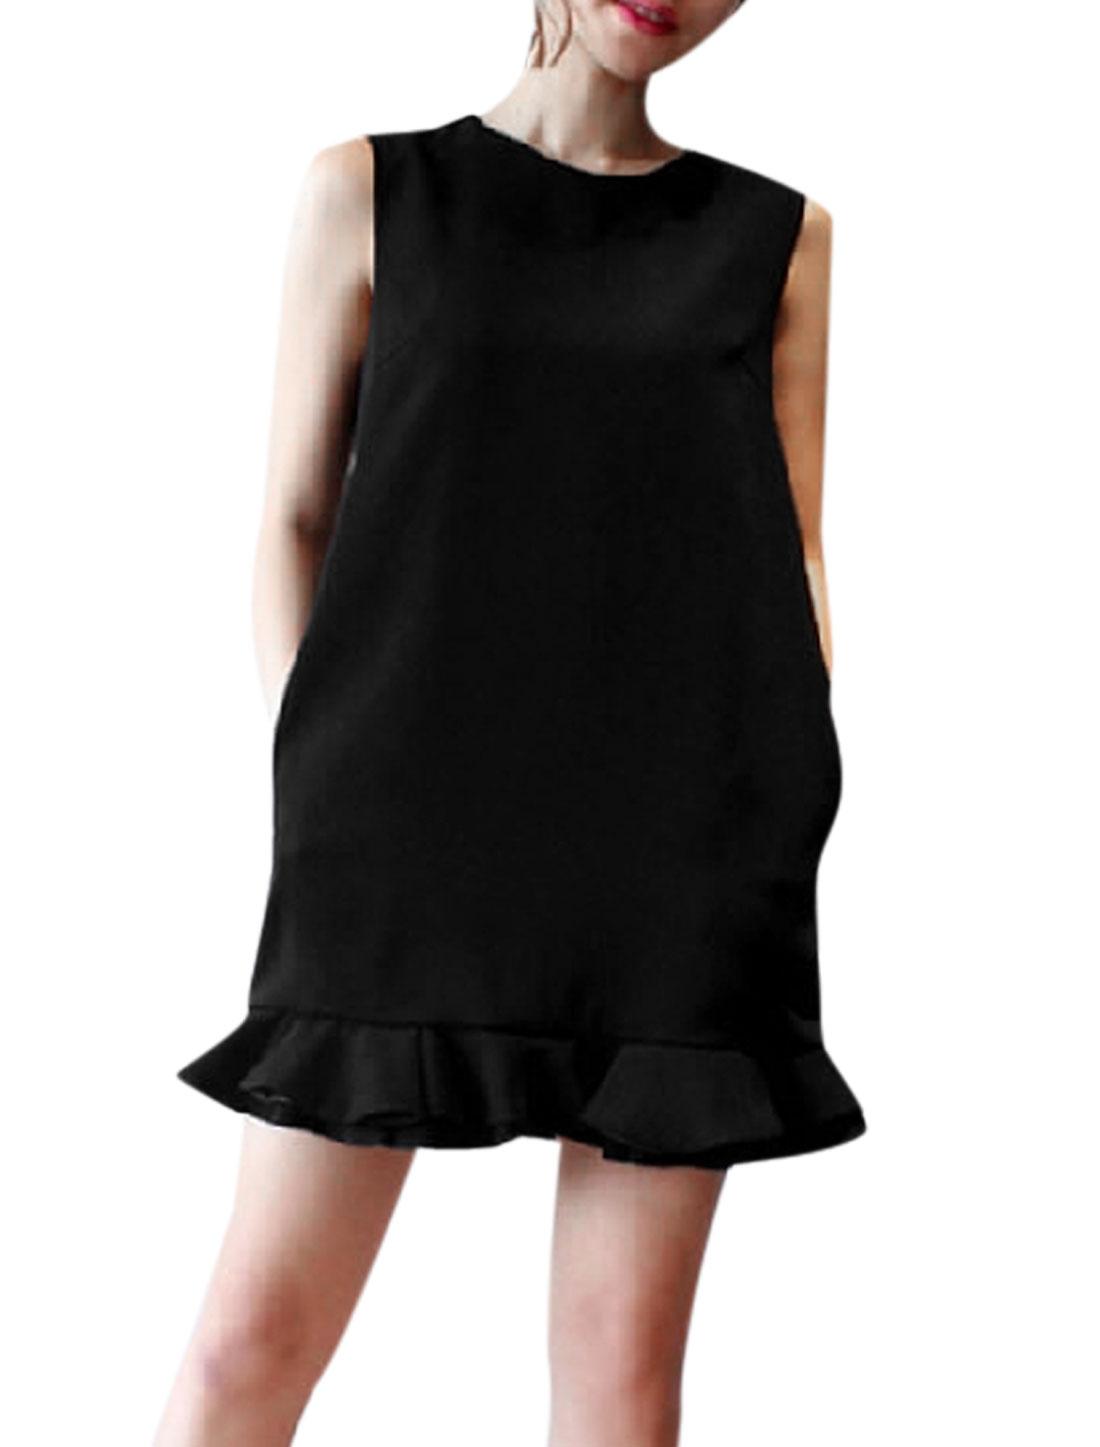 Lady Hidden Zipper Back Above Knee Ruffle Hem Straight Dress Black S